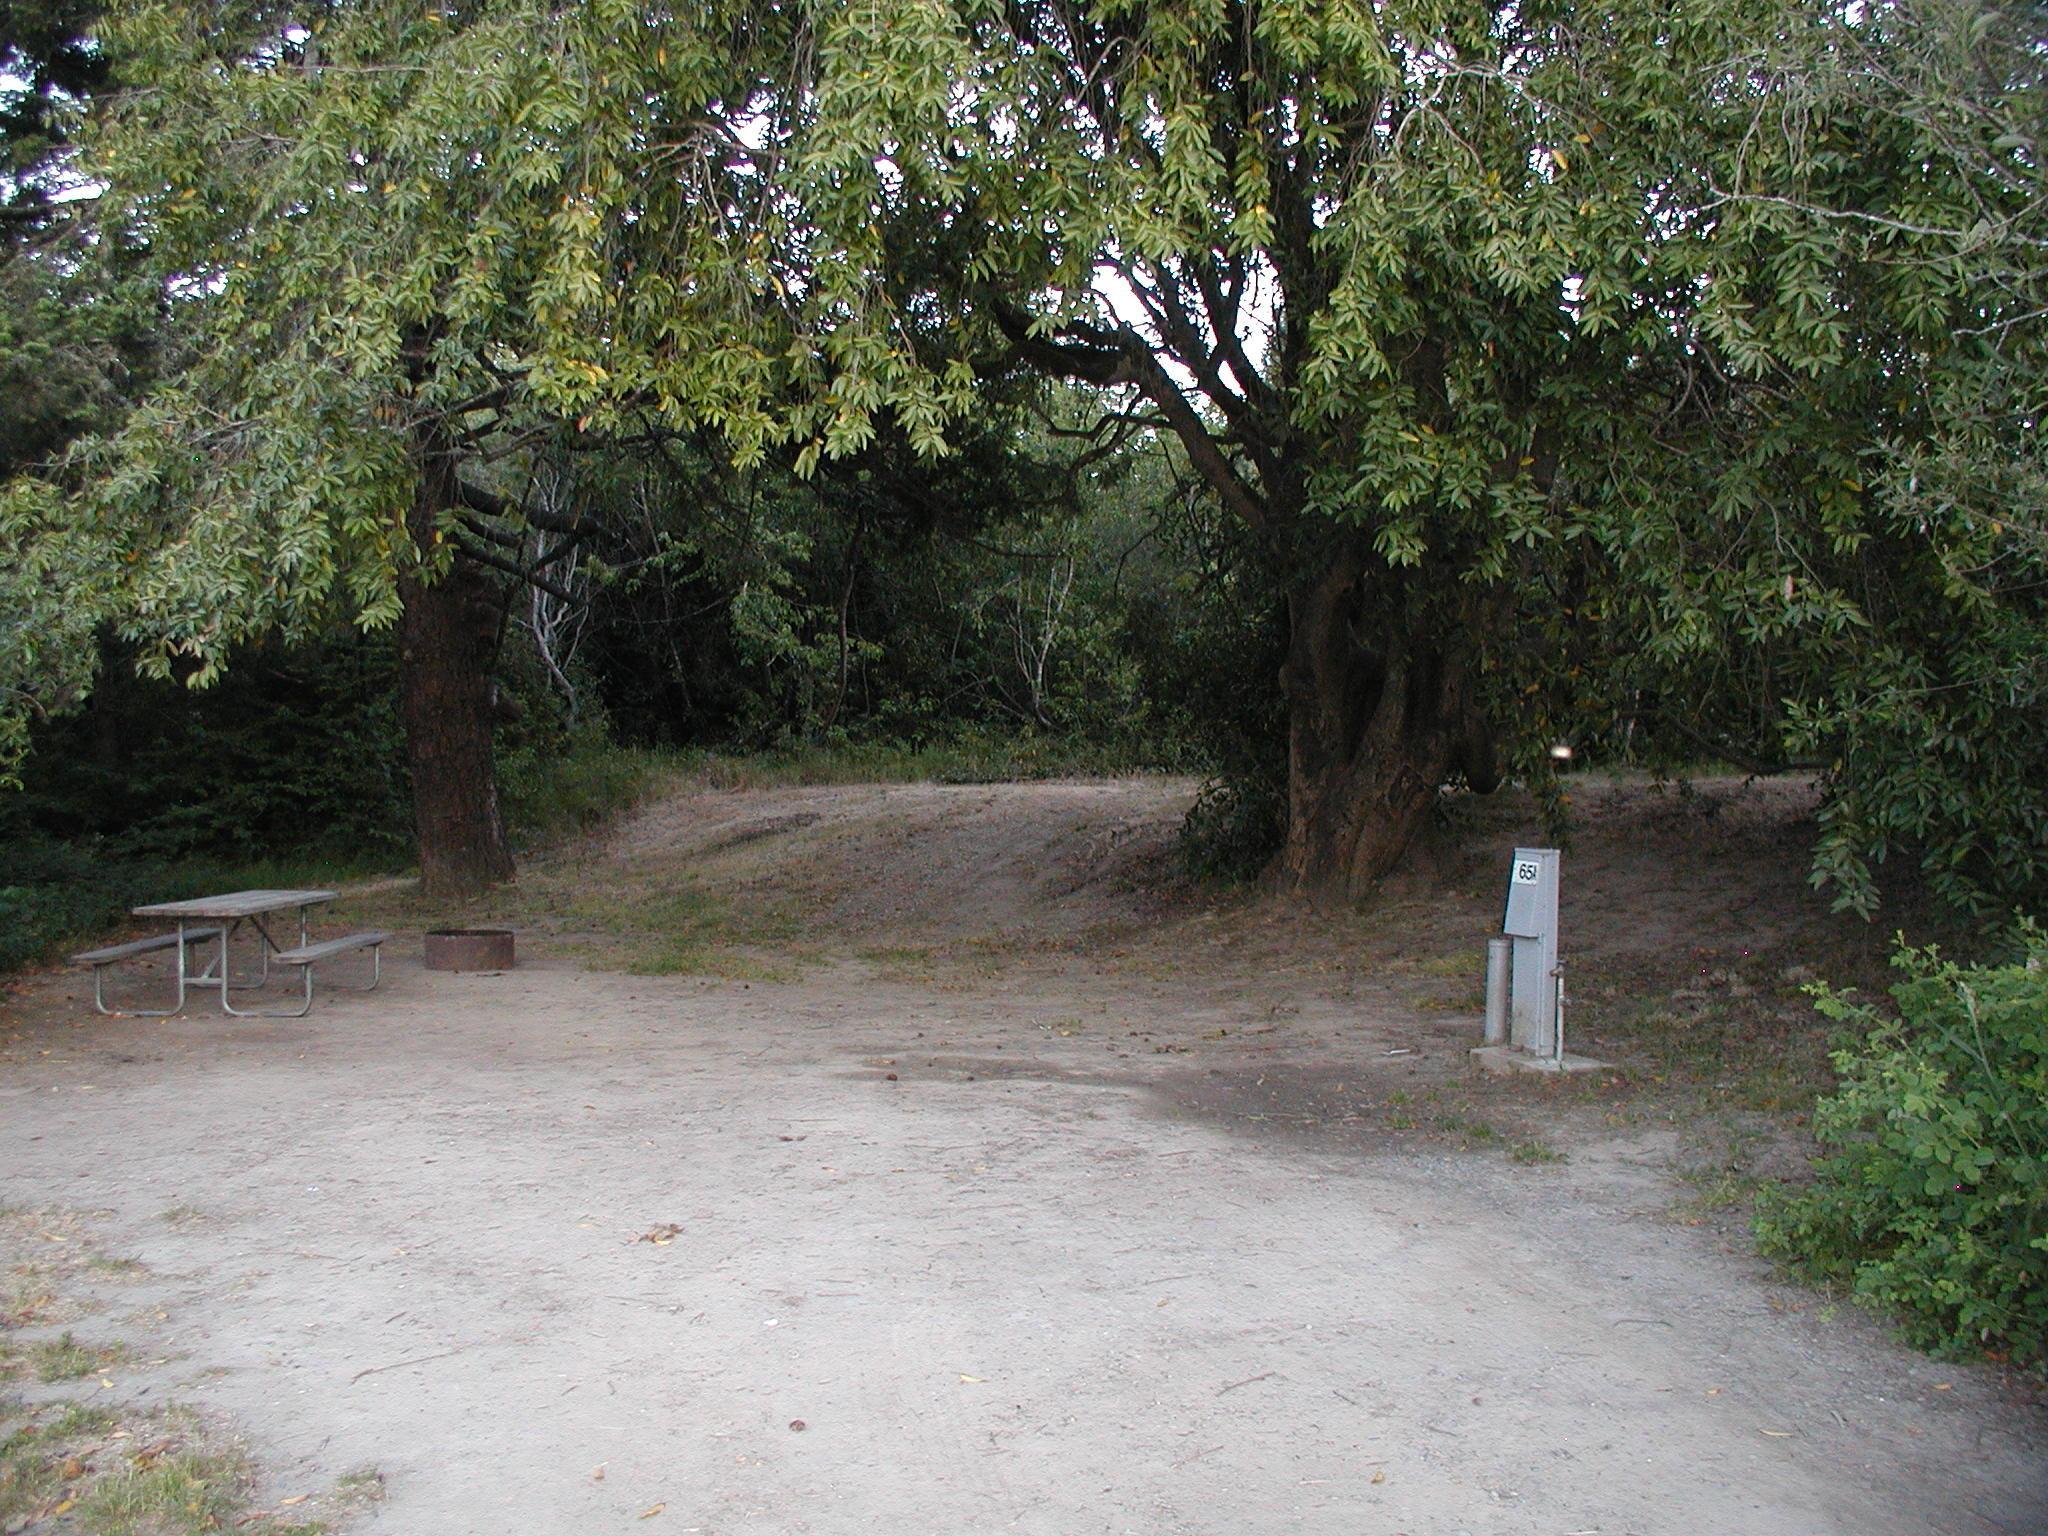 Casini Ranch Campground